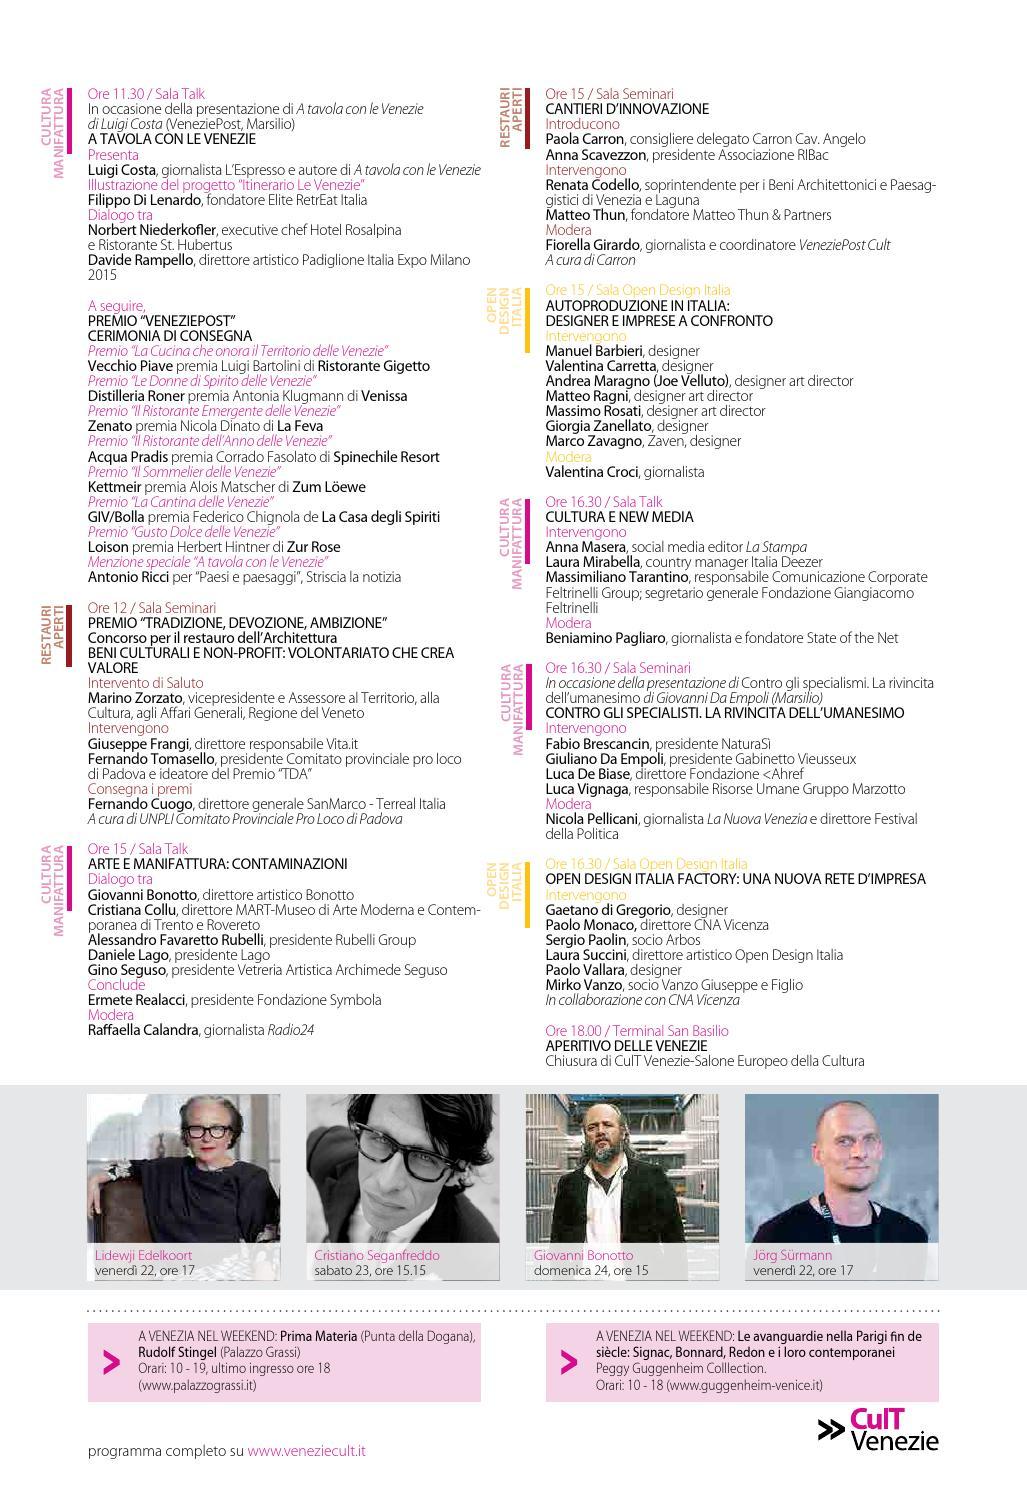 CulT Venezie 2013 - Programma ufficiale by Antonio Maconi